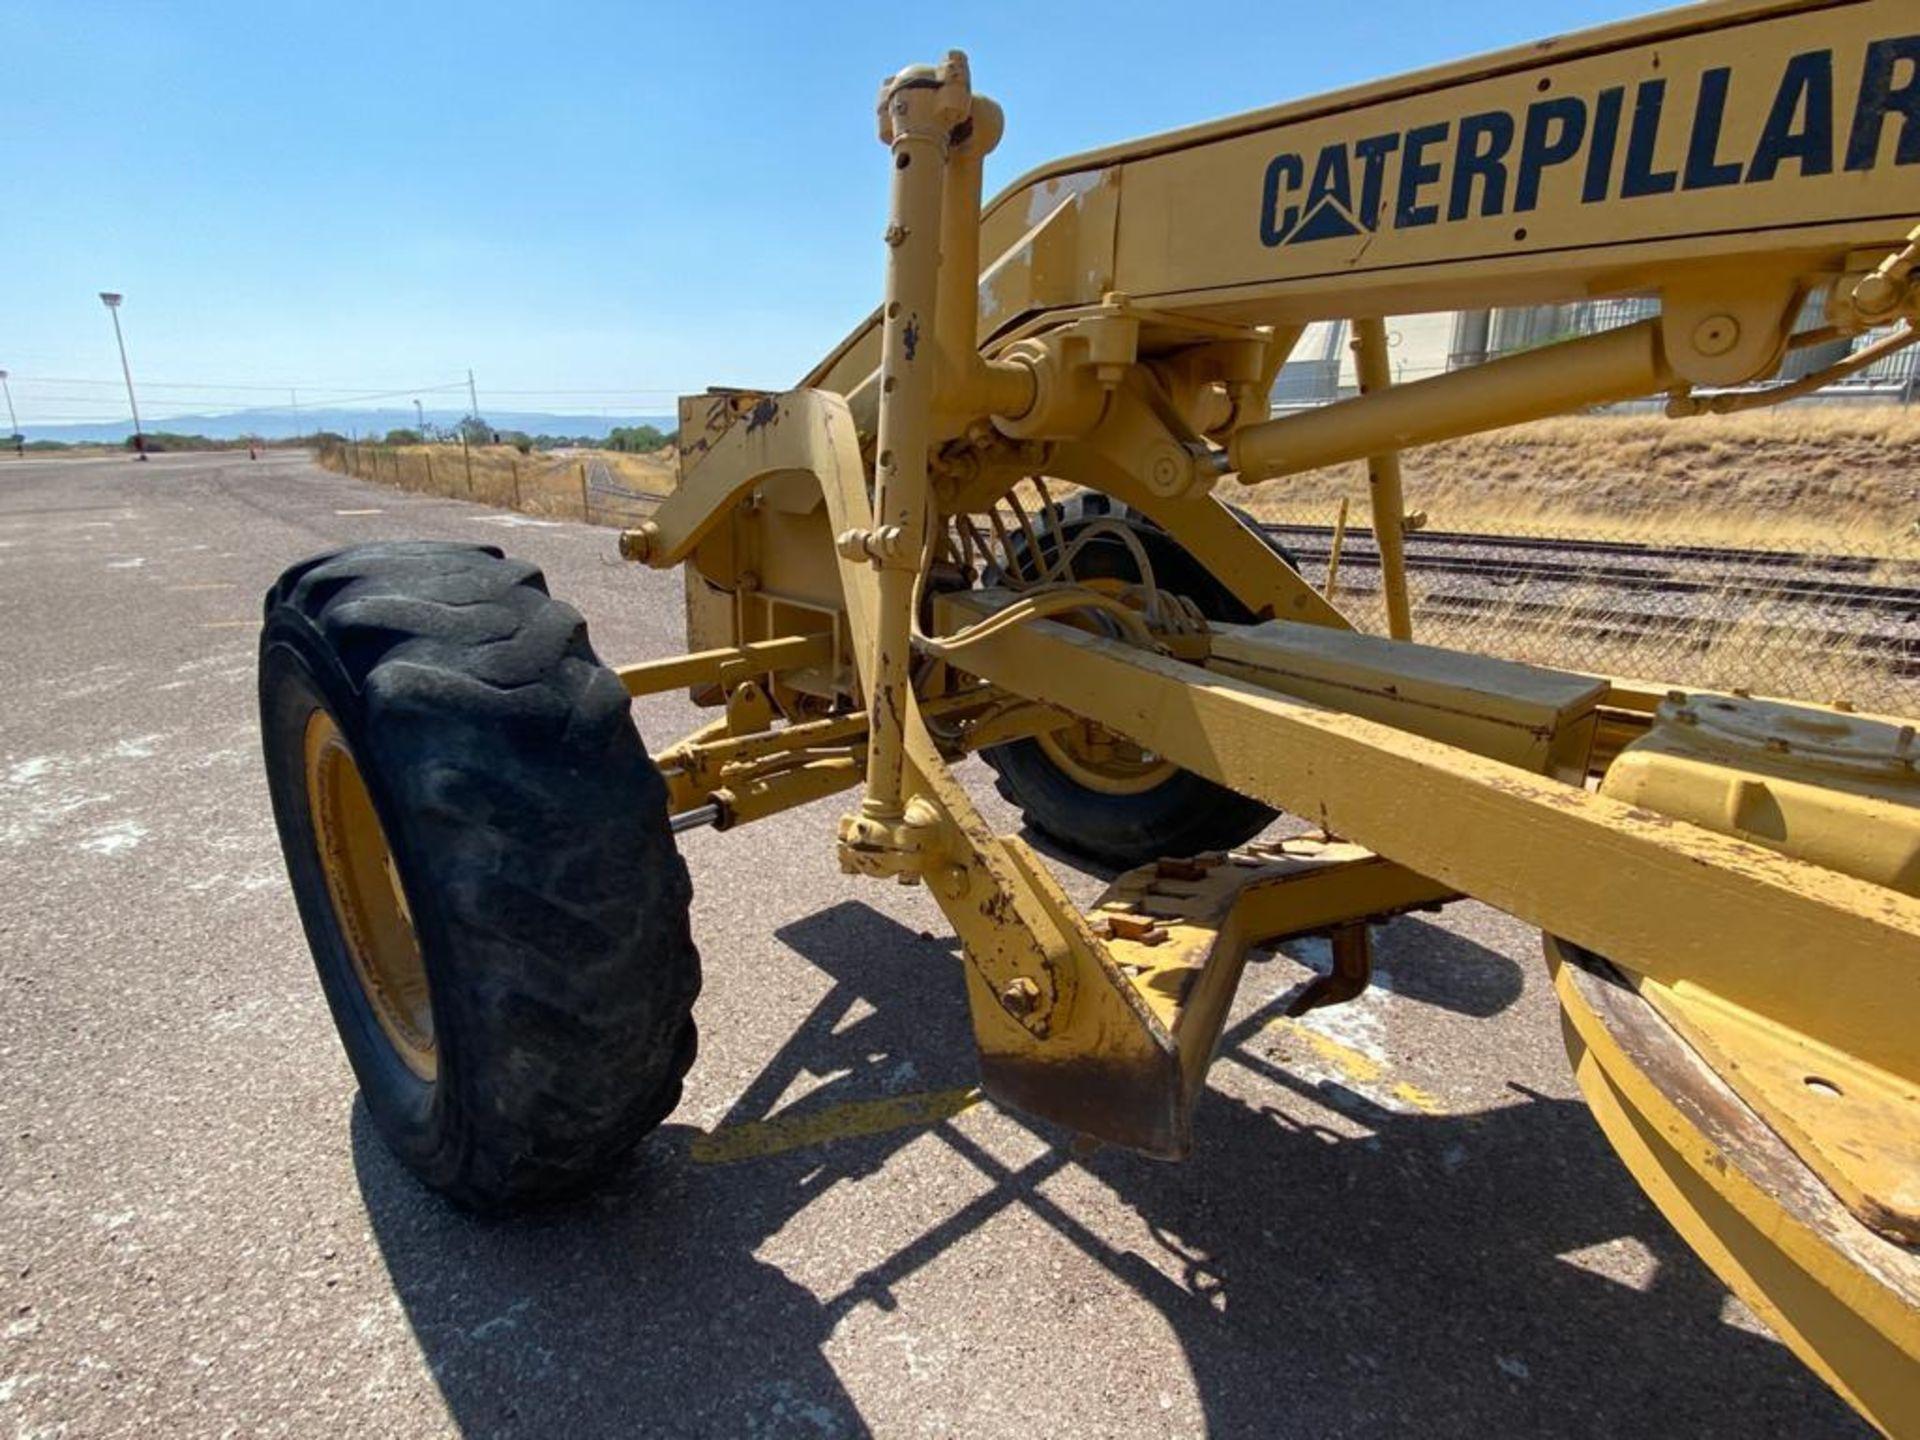 Caterpillar 120G Motor Grader, Serial number 87V09646, Motor number PQ883-2/07Z28983 - Image 28 of 61